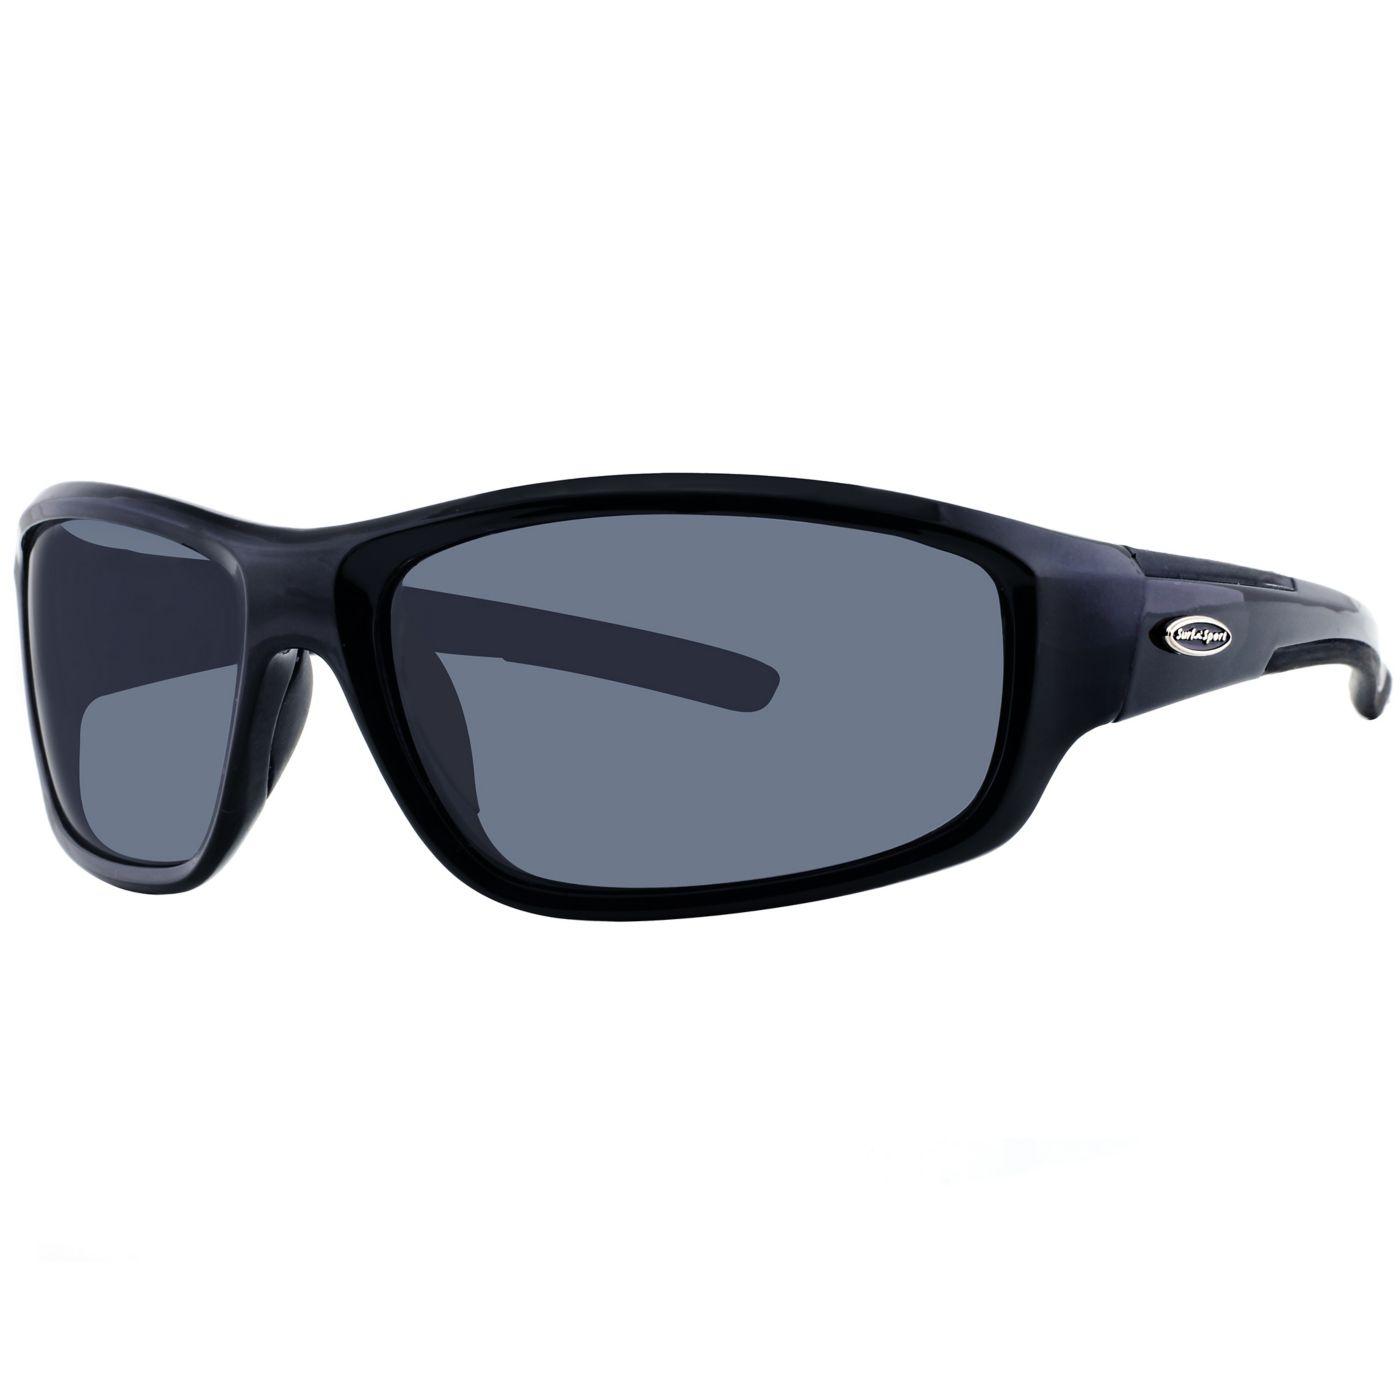 Surf N Sport Shack Polarized Sunglasses